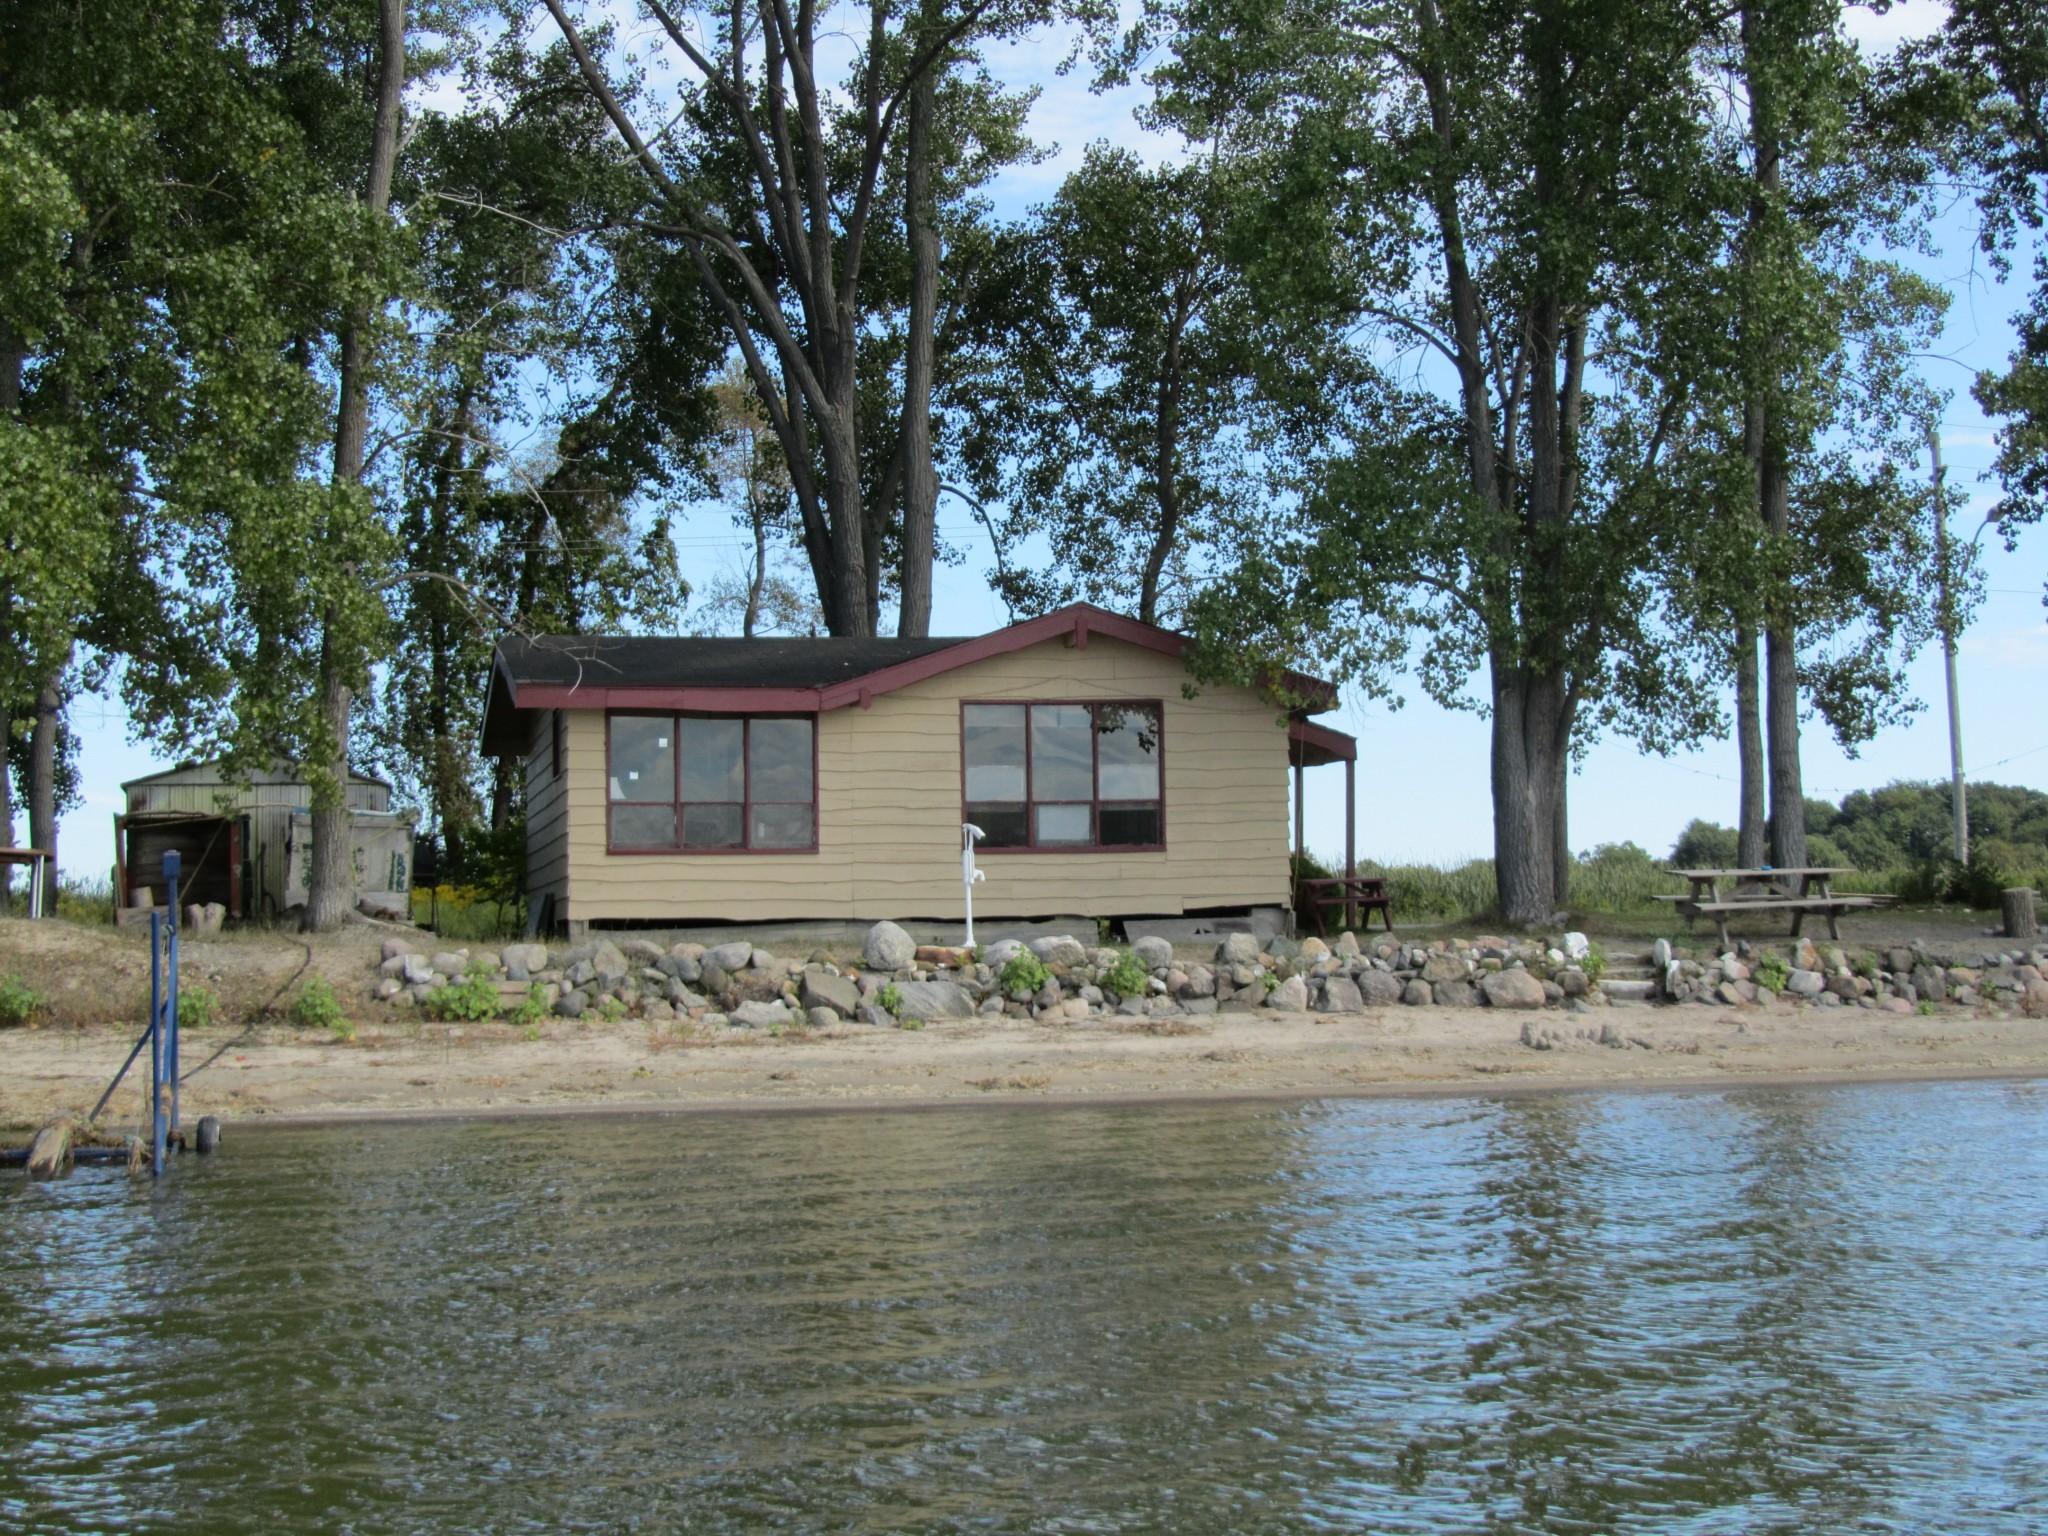 The Sandbanks Beach Cottage